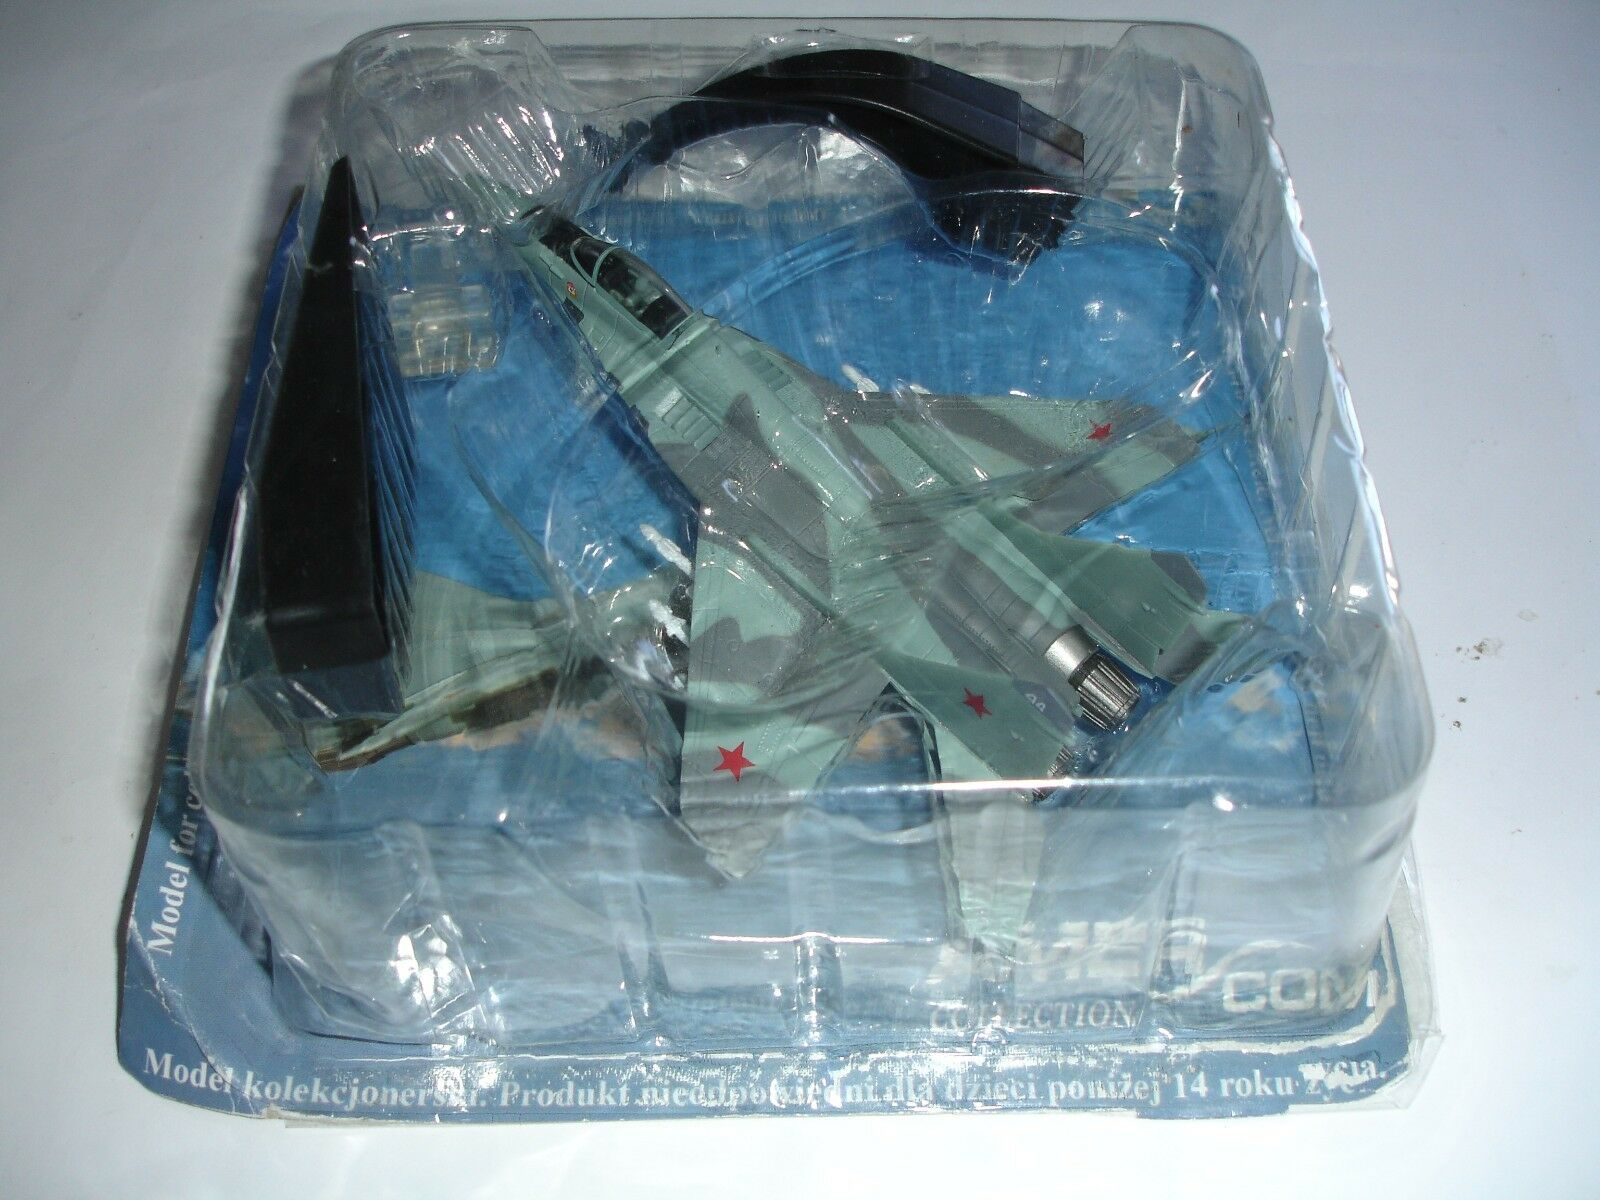 MIKOYAN MIG-29 MIG-29 MIG-29 FULCRUM-C 234 GUARDS FIGHTER REGIMENT 1991 1 100 SCALE DIE-CAST 5b947a